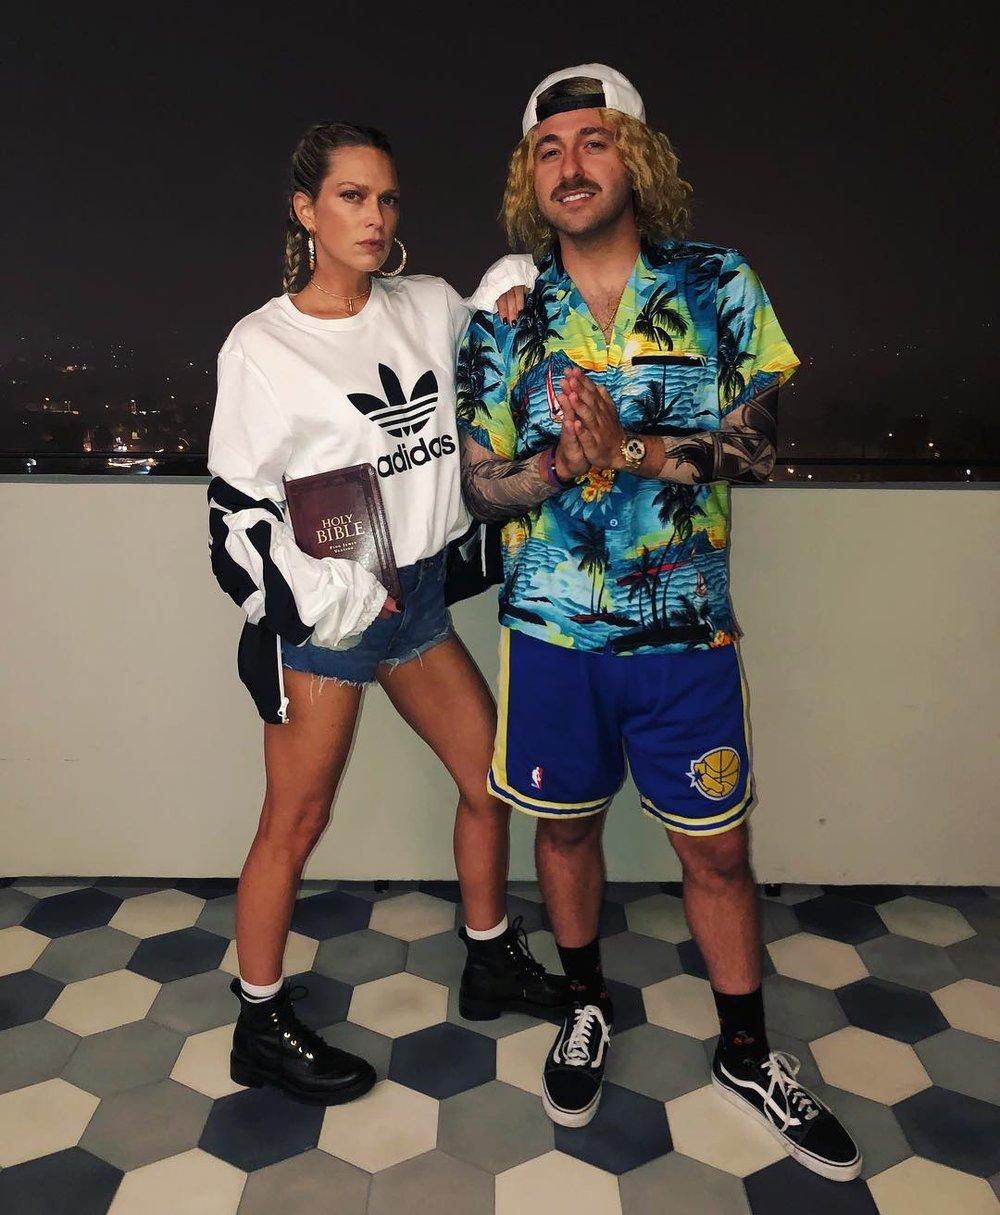 Erin Foster + Simon Tikhman as Hailey Baldwin + Justin Bieber // via instagram.com/erinfoster